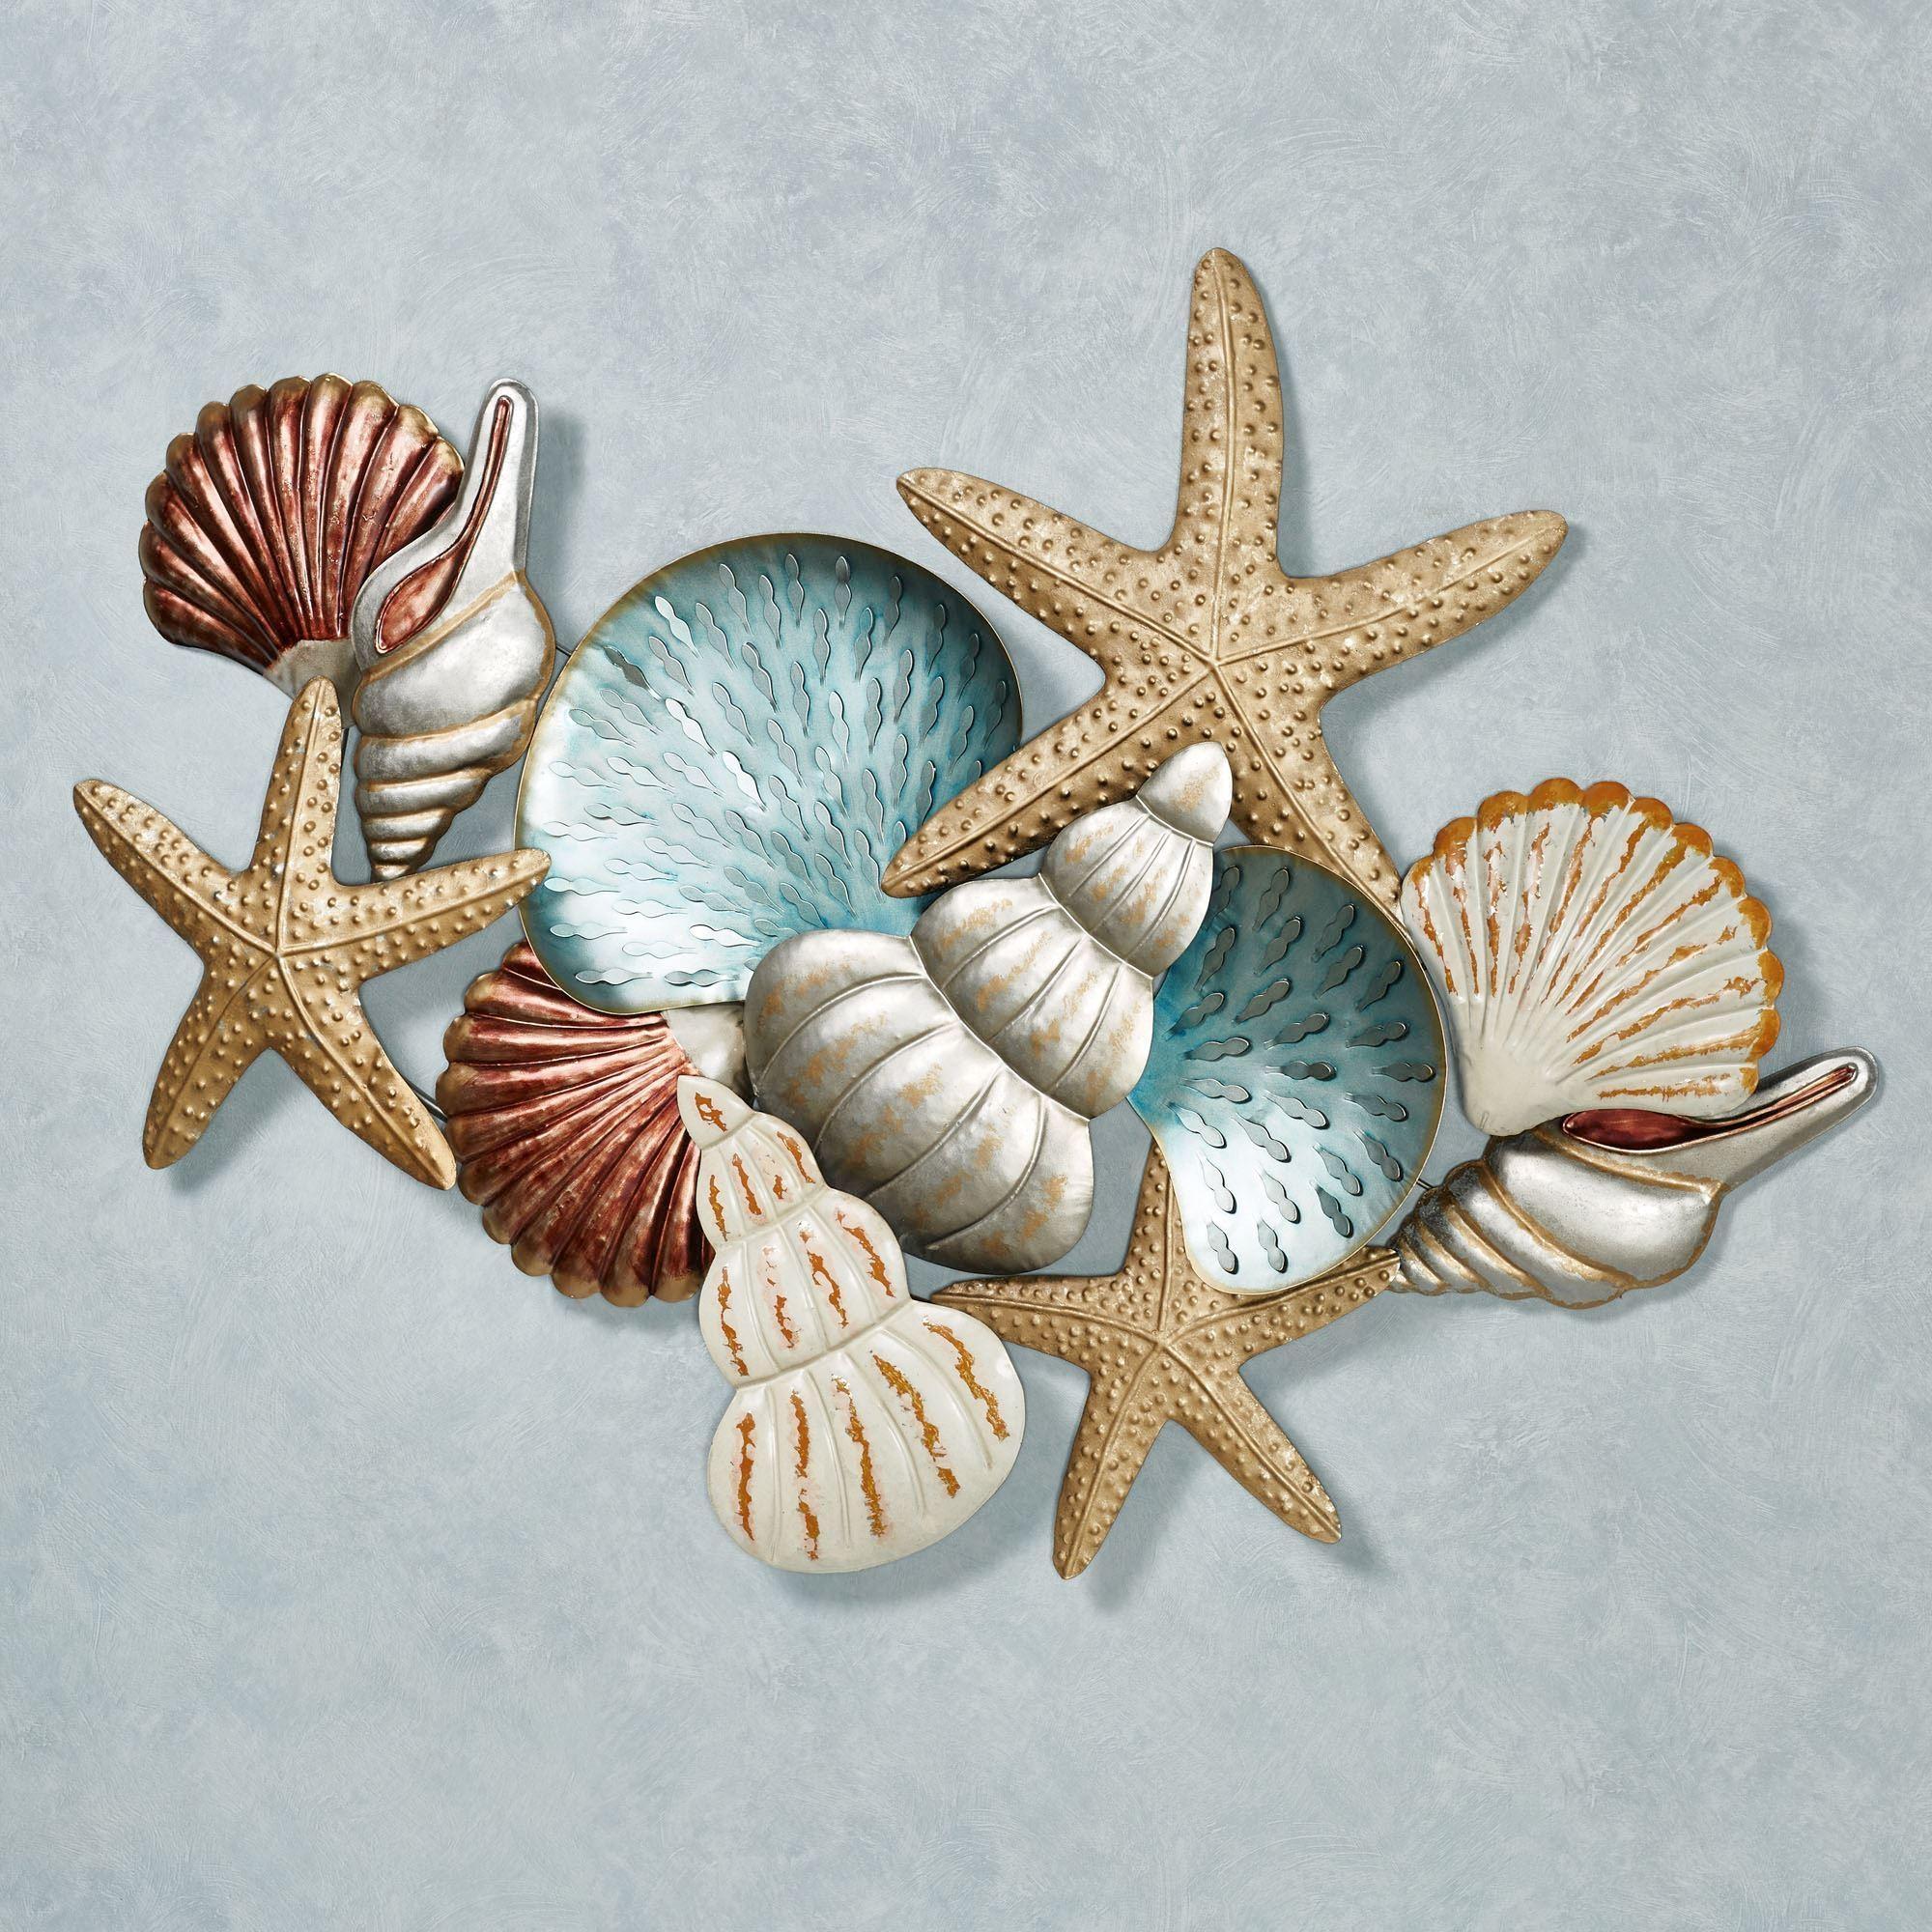 Ocean Collage Metal Wall Art Regarding Metallic Wall Art (Image 15 of 20)